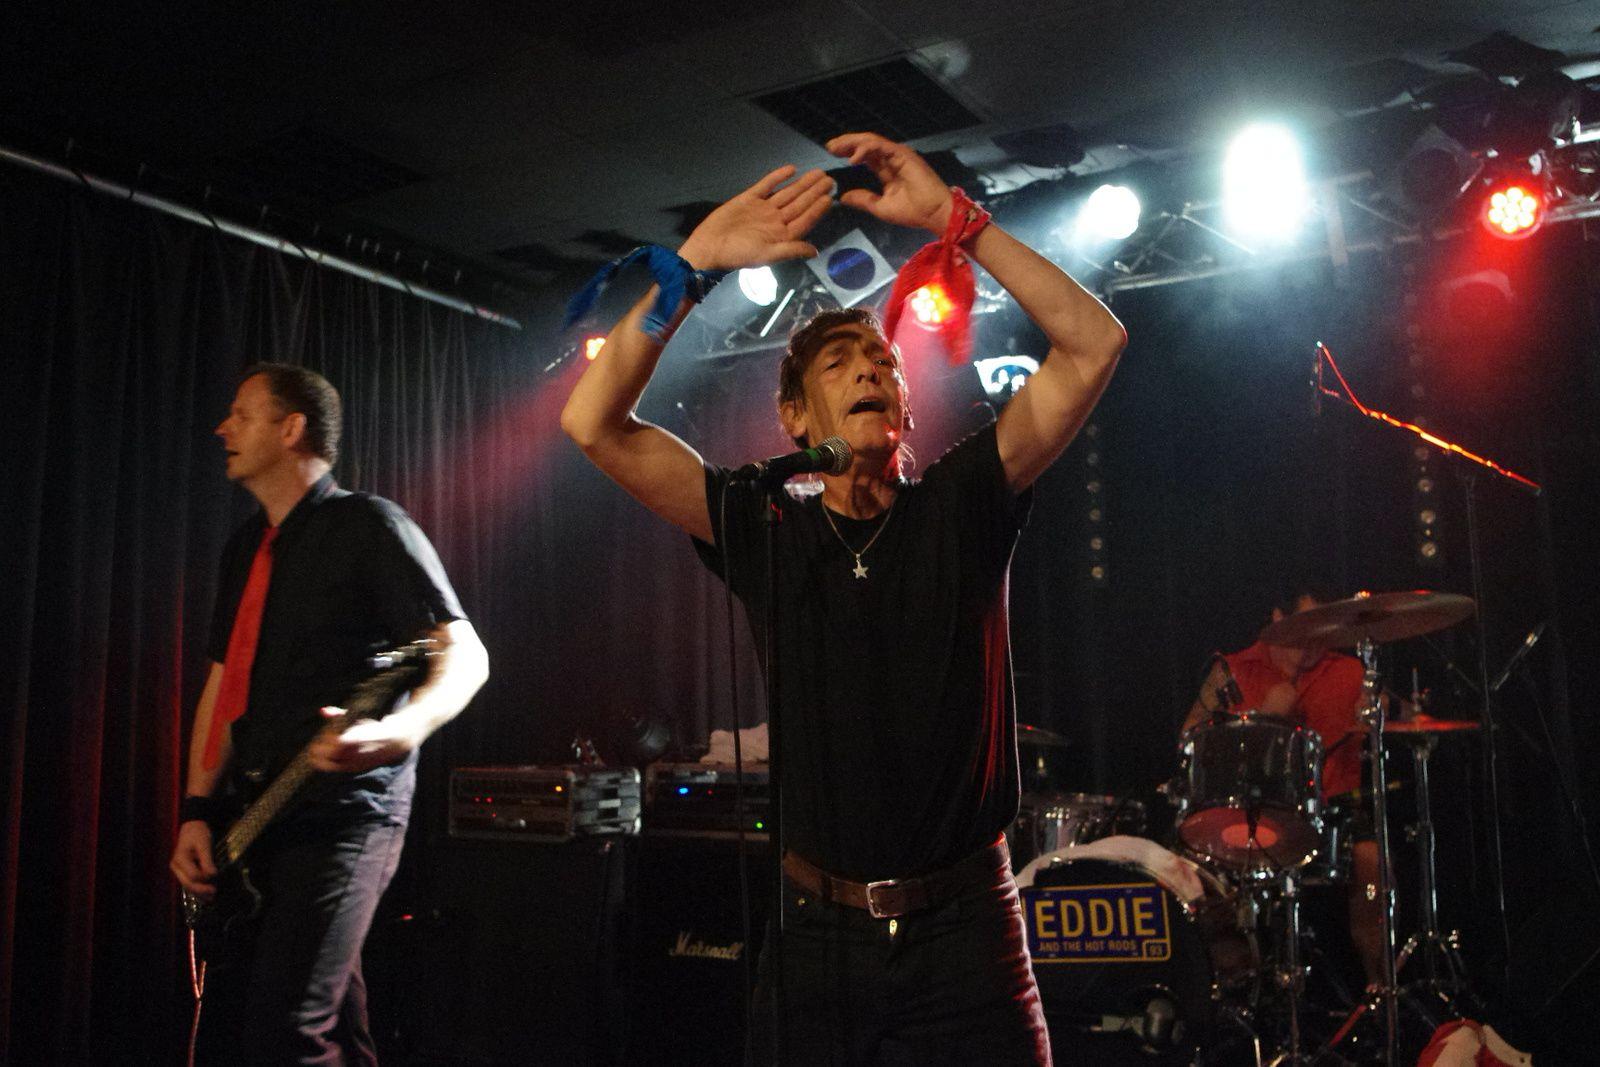 Eddie & The Hot Rods - 29 avril 2014 - La Boite à Musiques, Wattrelos (59)